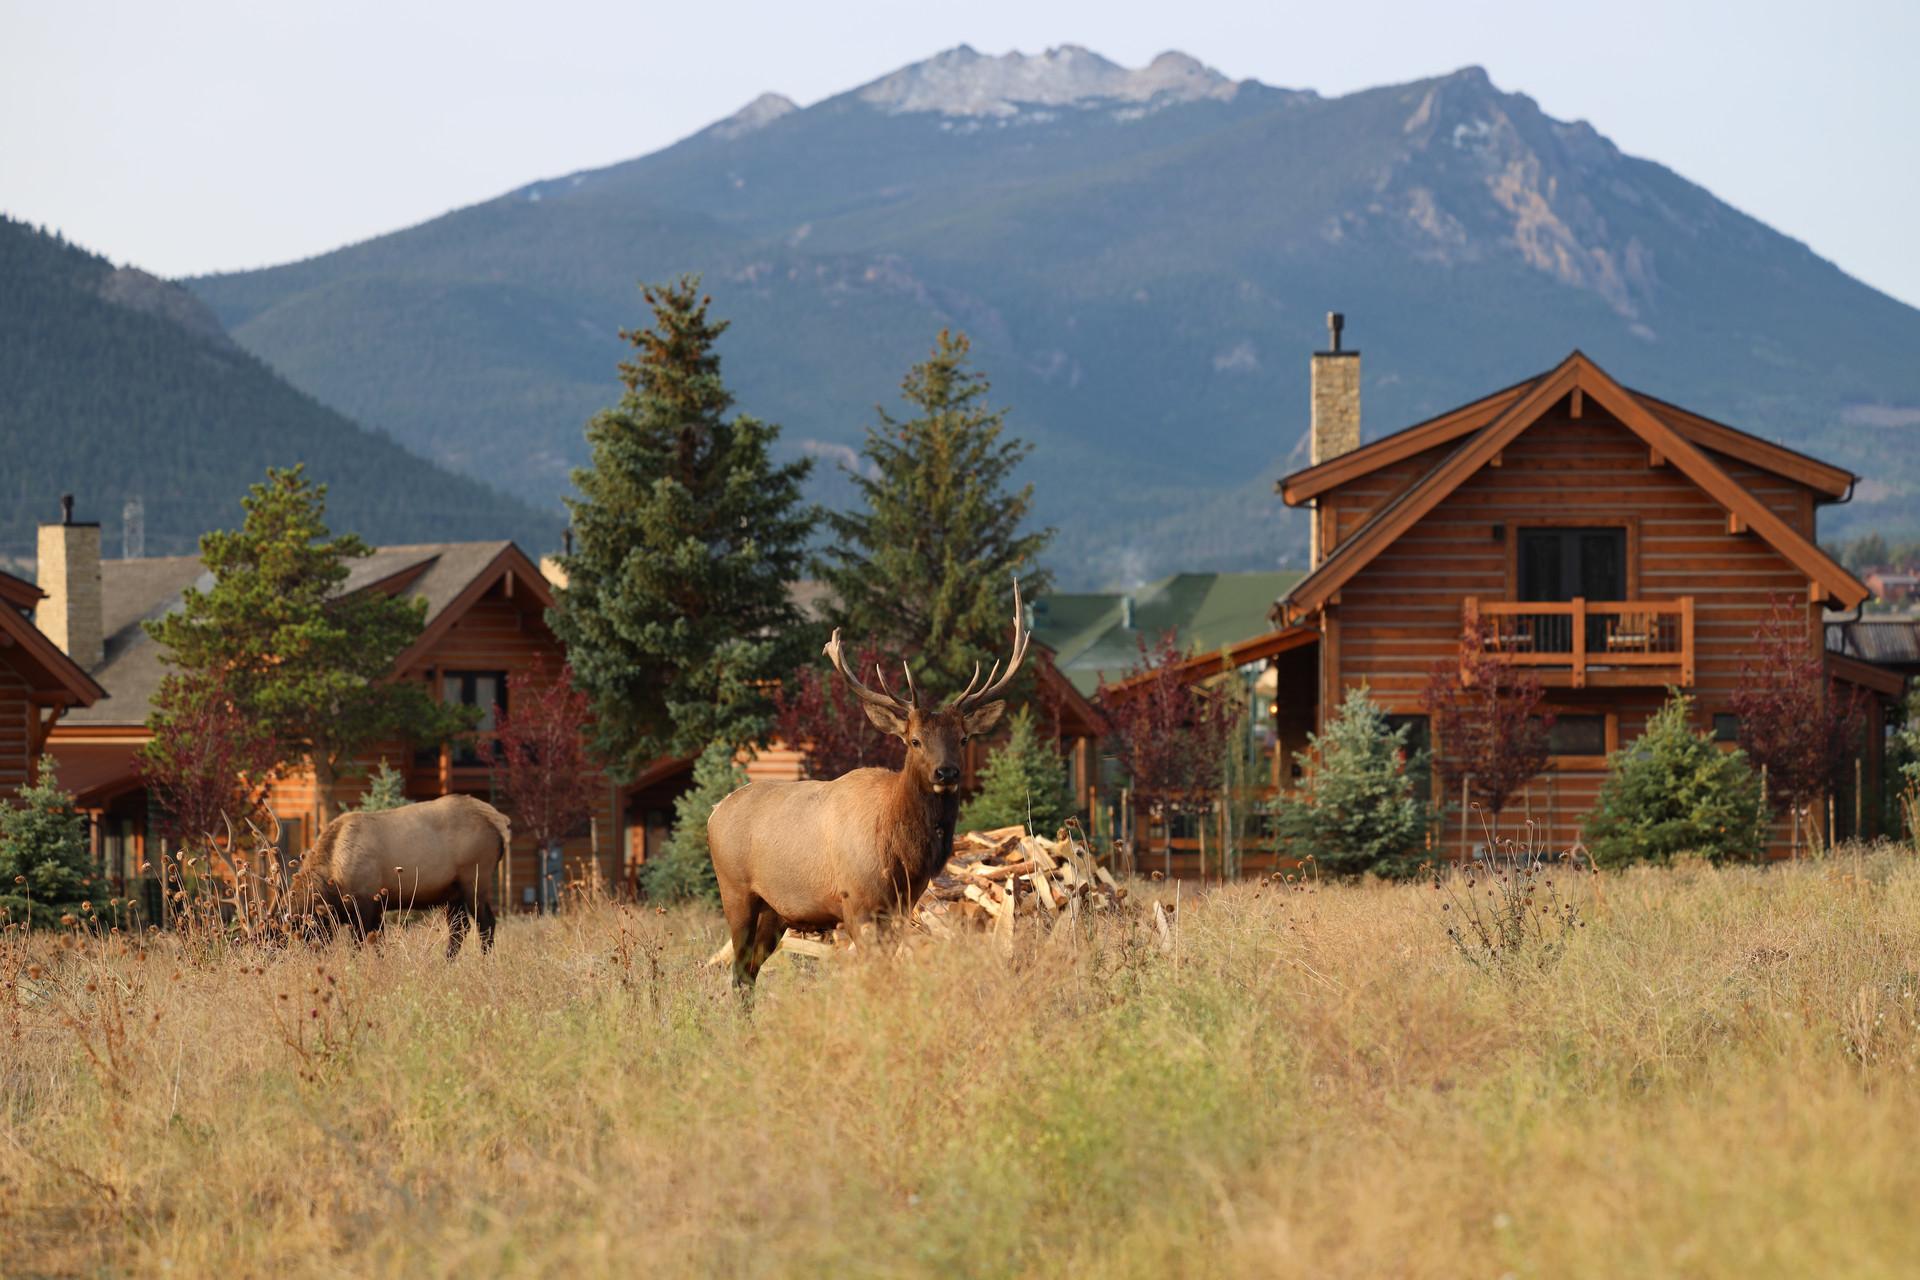 Mountain Village Cabins